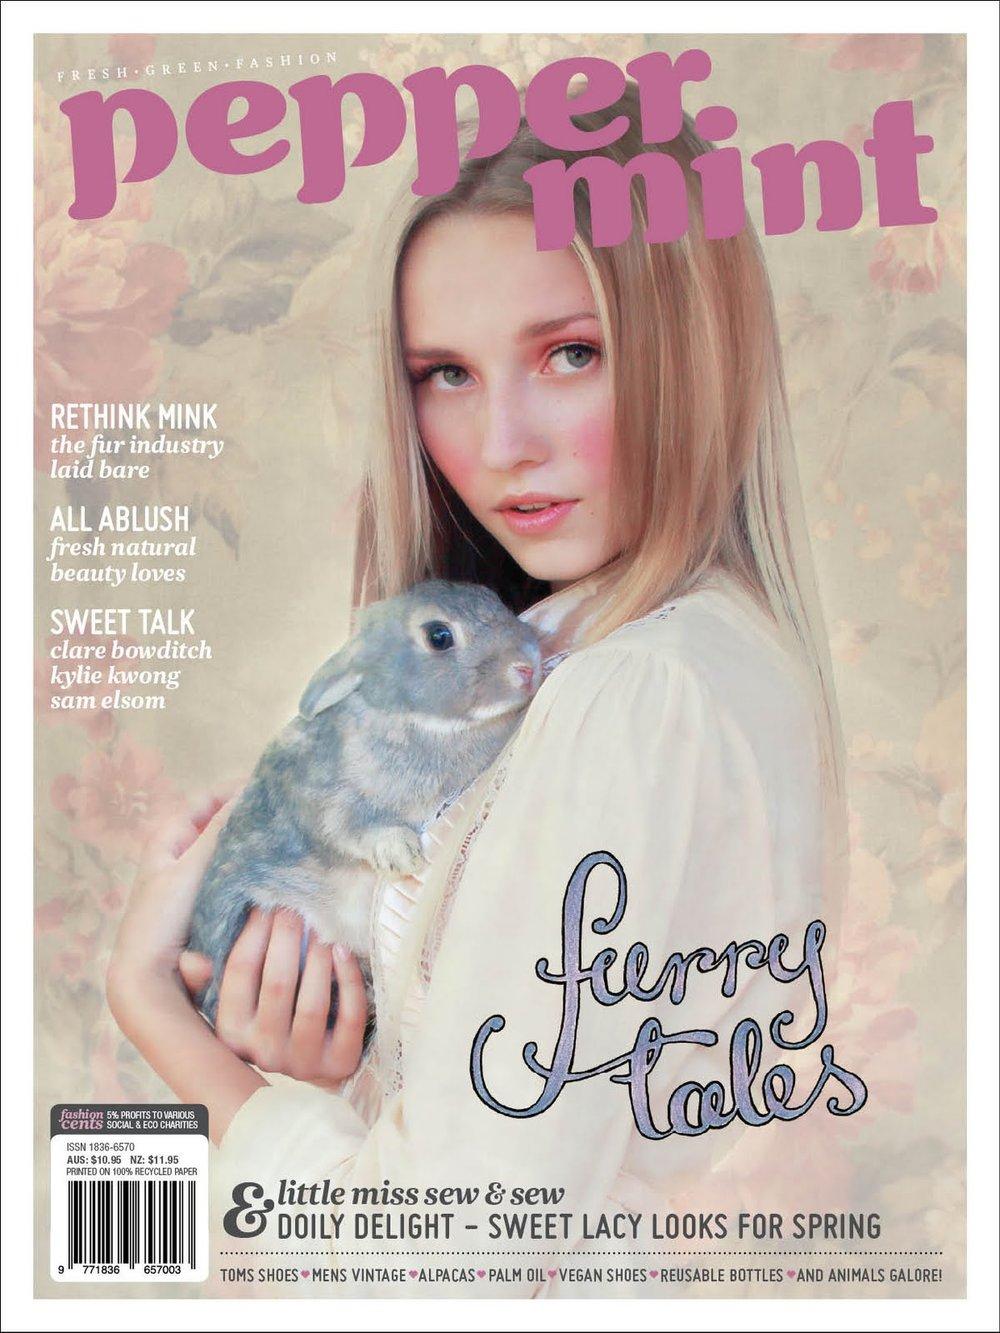 PeppermintMagazineTheReallyGreenShop.jpg